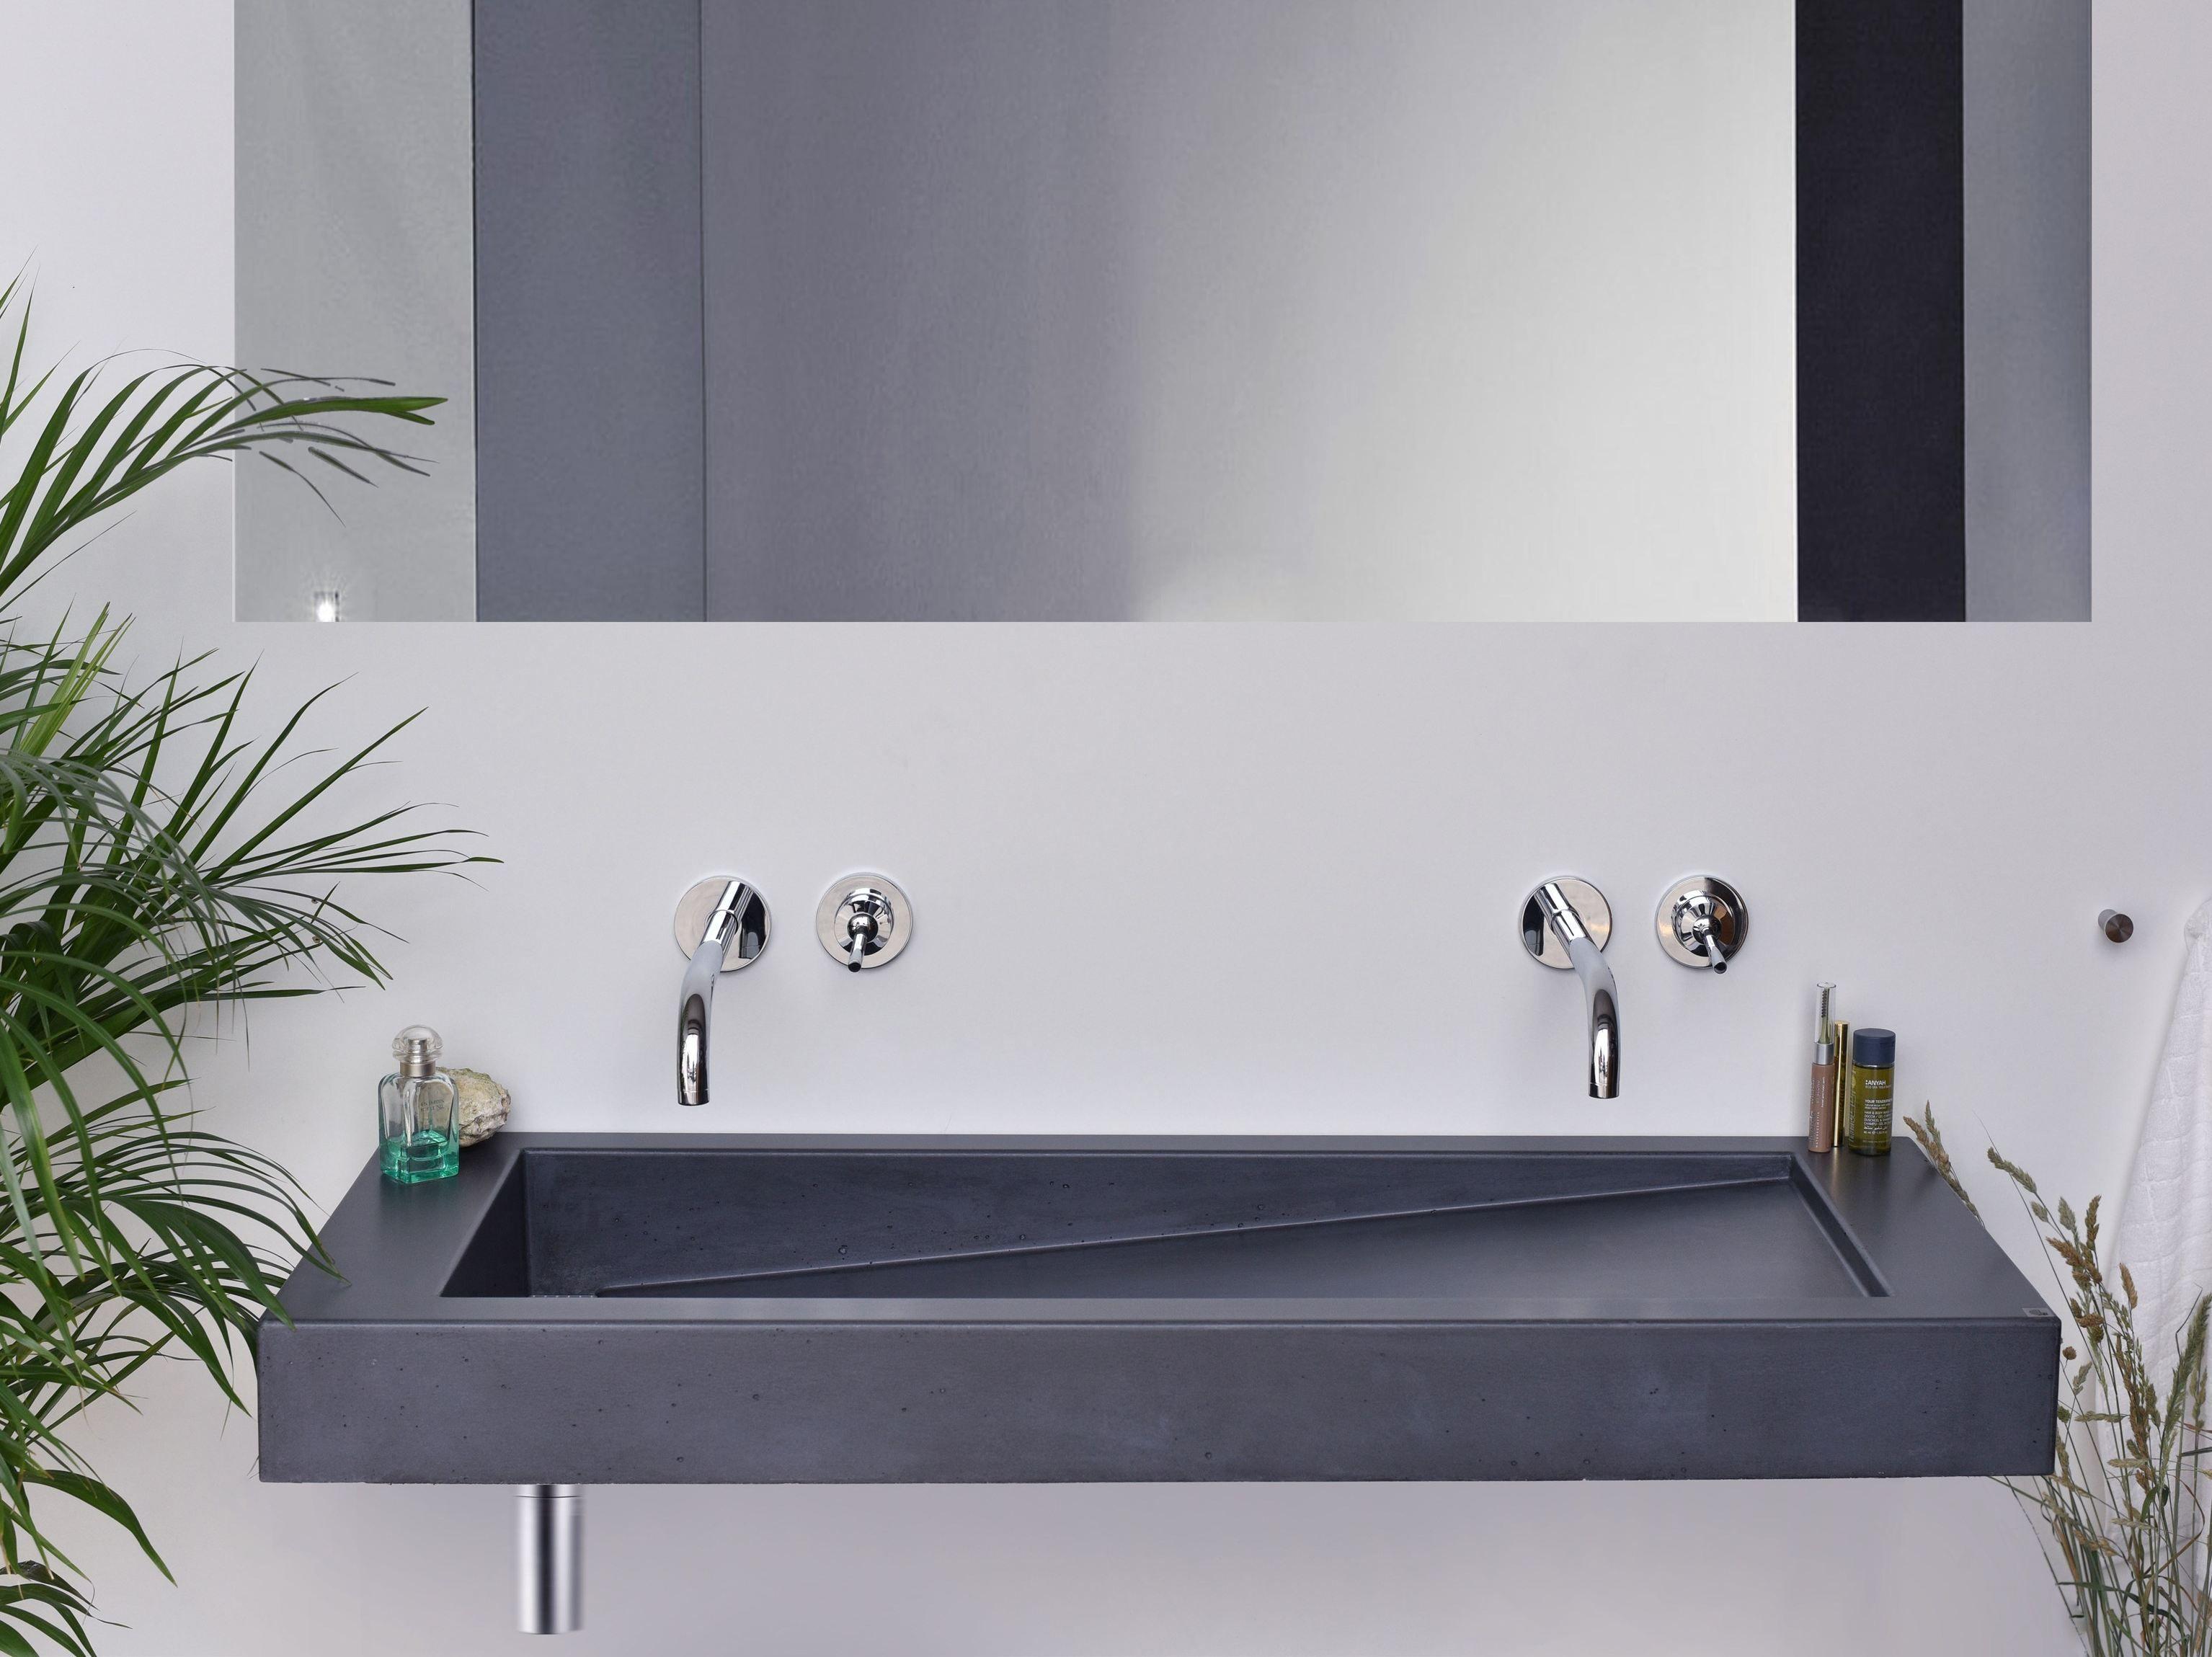 Double Wall Mounted Concrete Washbasin SLANT 03 DOUBLE By Gravelli Design  Tomáš Vacek